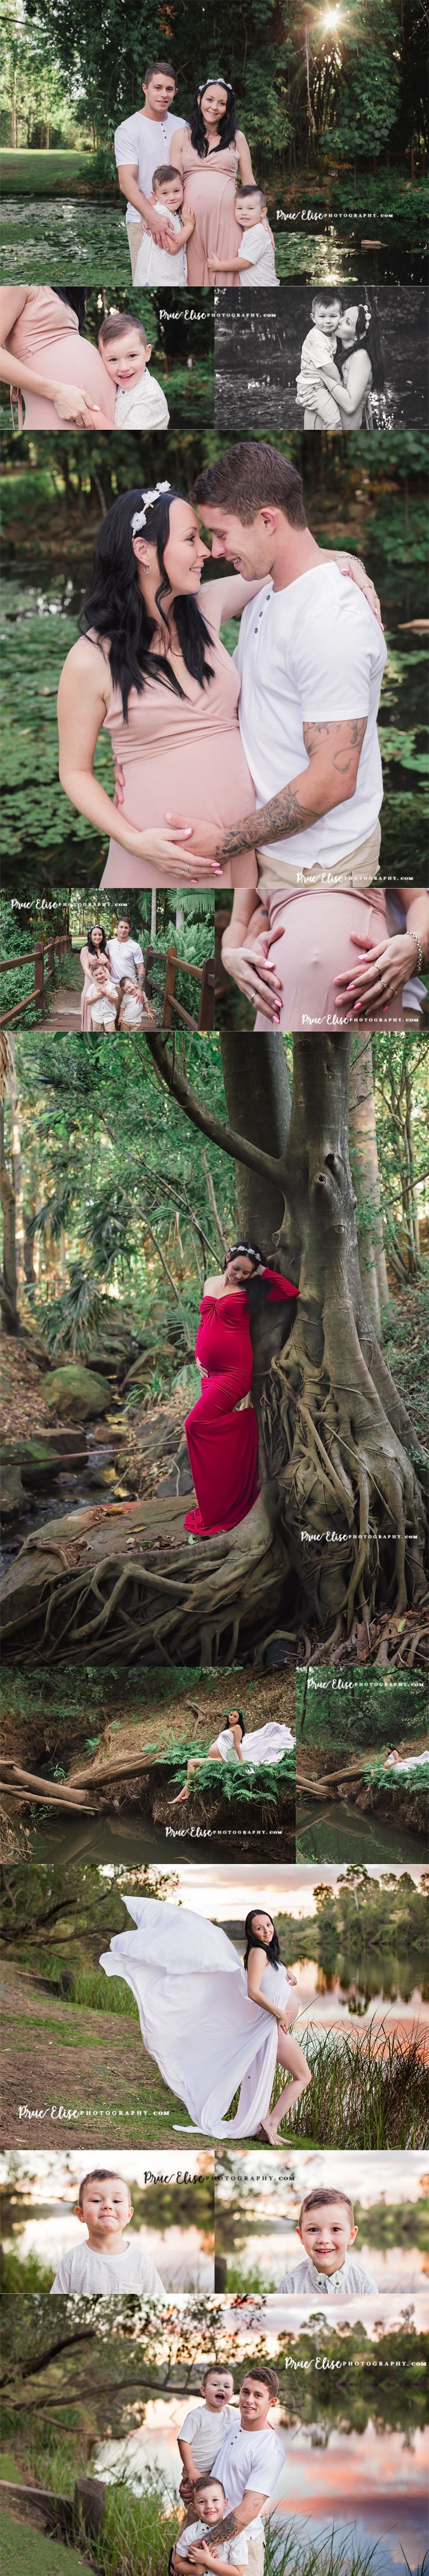 Ipswich Pregnancy Photographer Prue Elise Photography